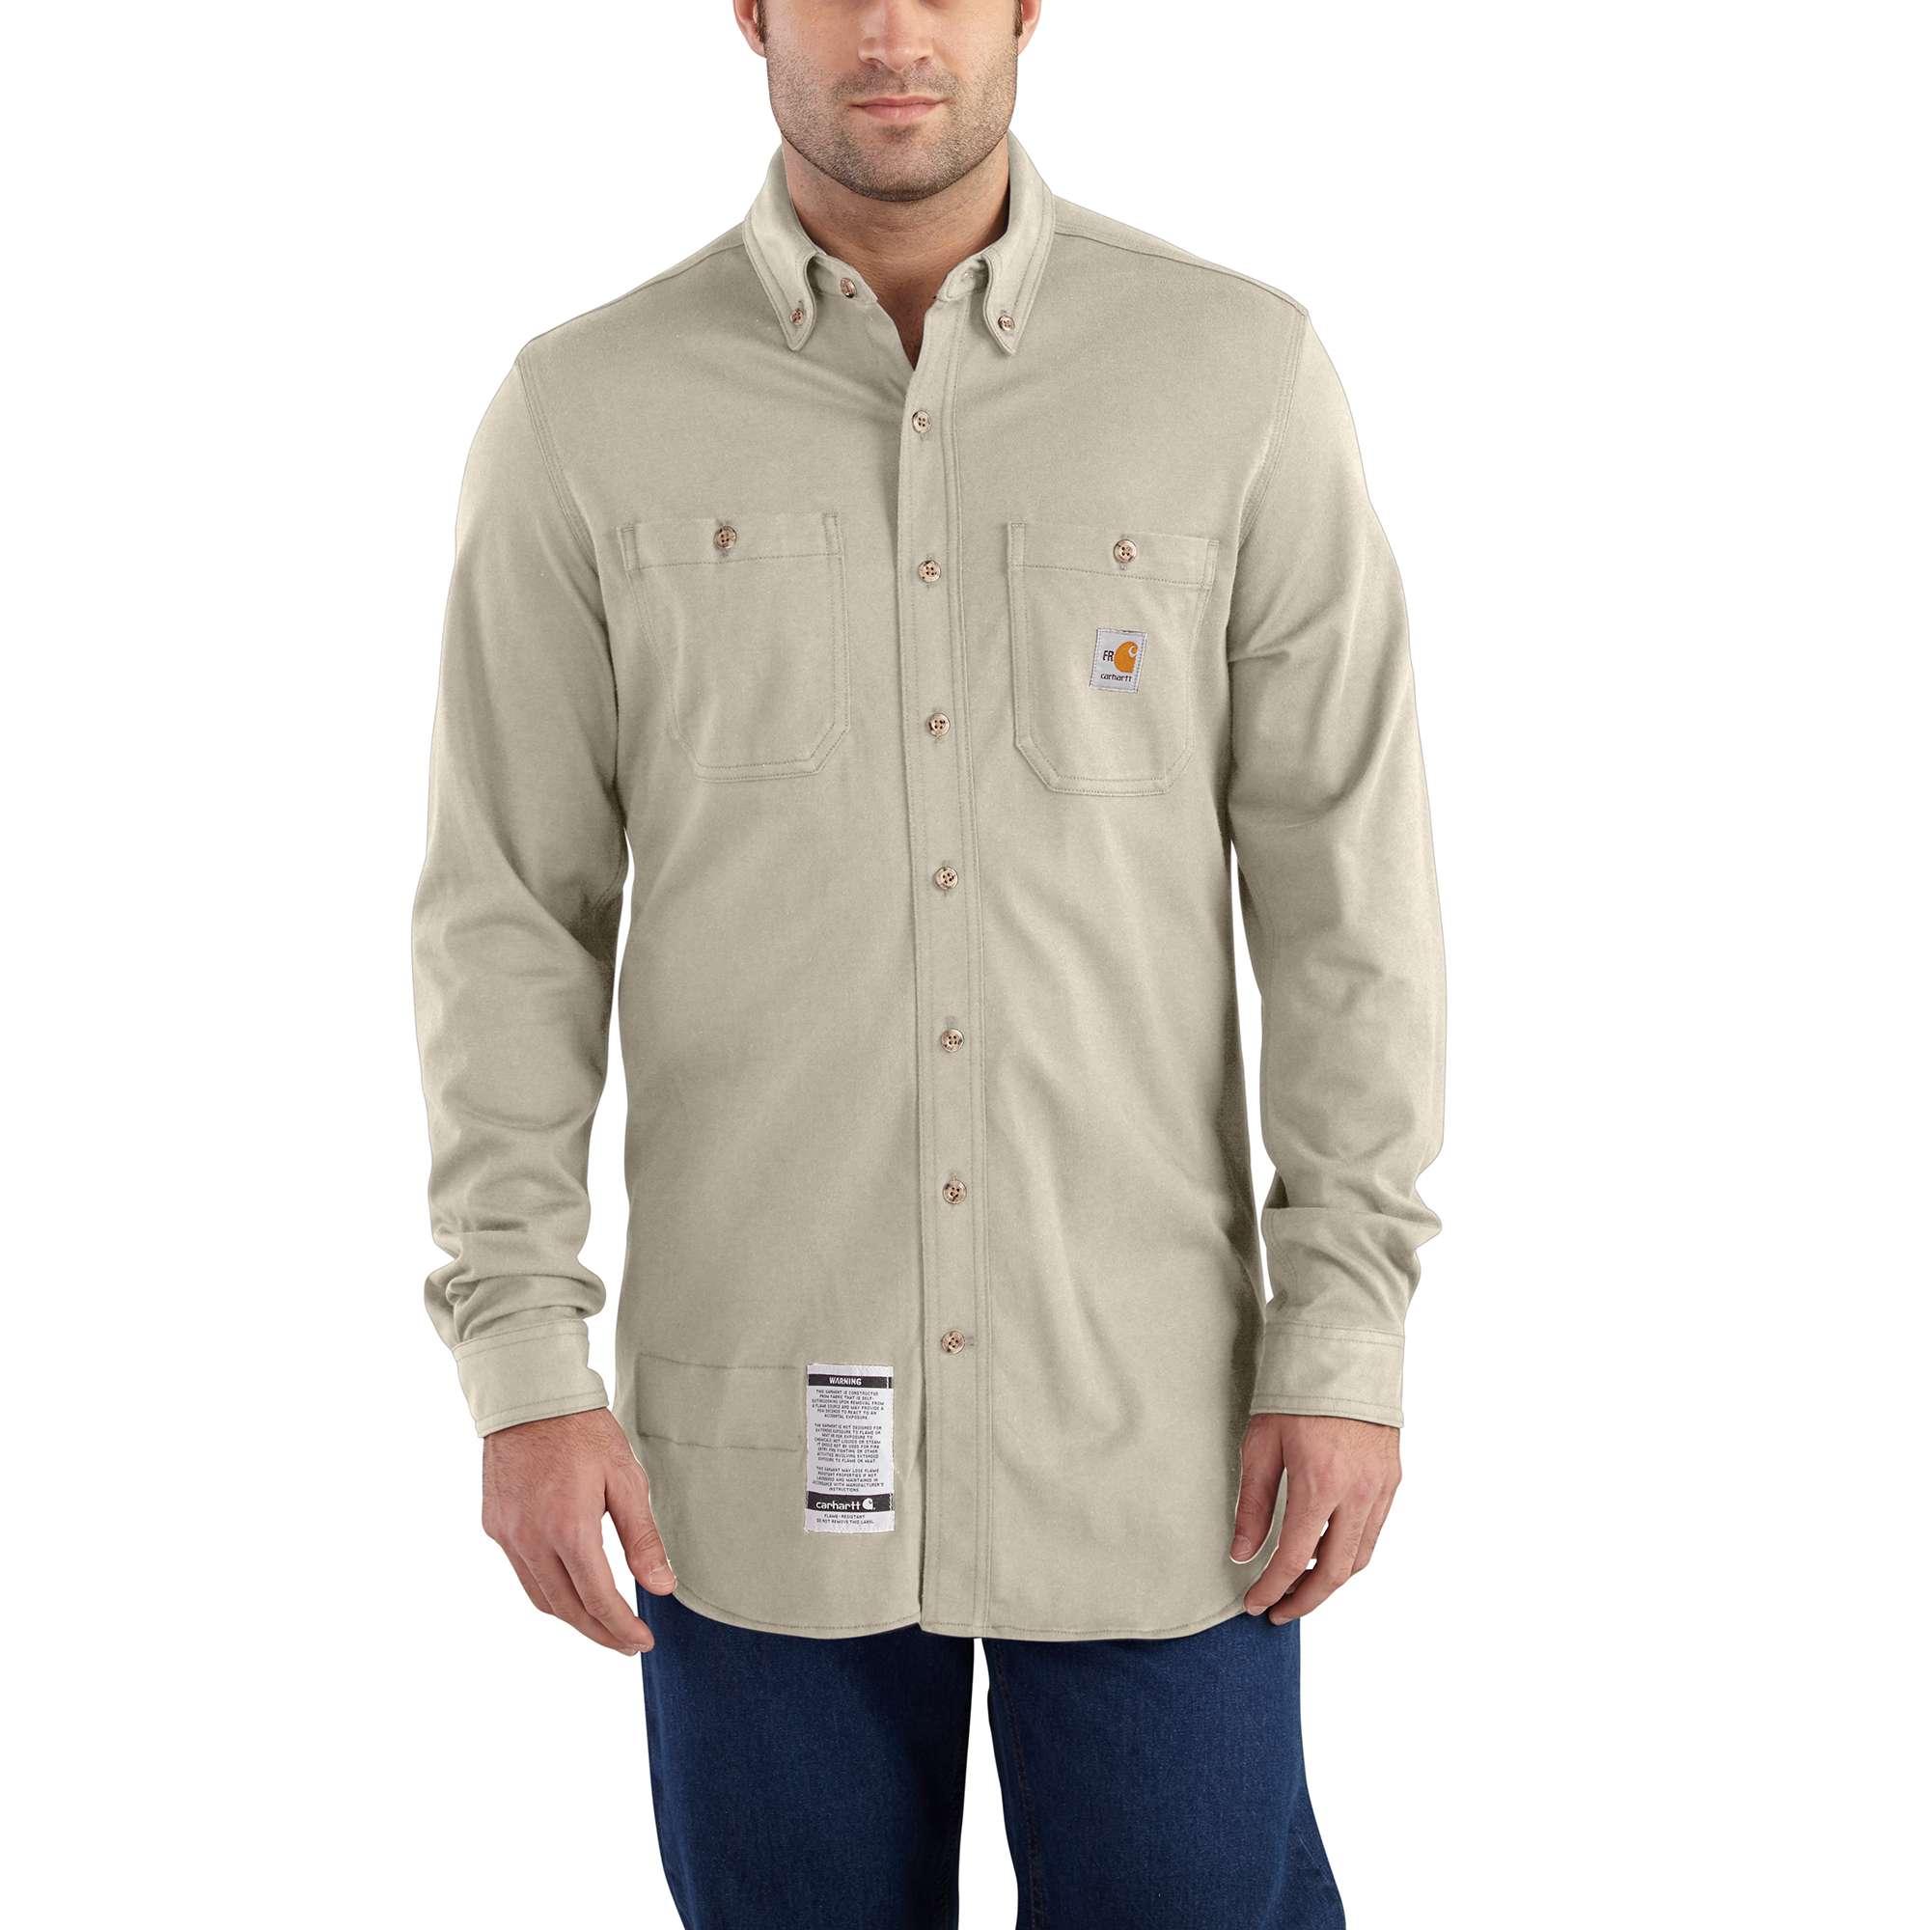 carhartt flame-resistant carhartt force cotton hybrid shirt sand 4xltl